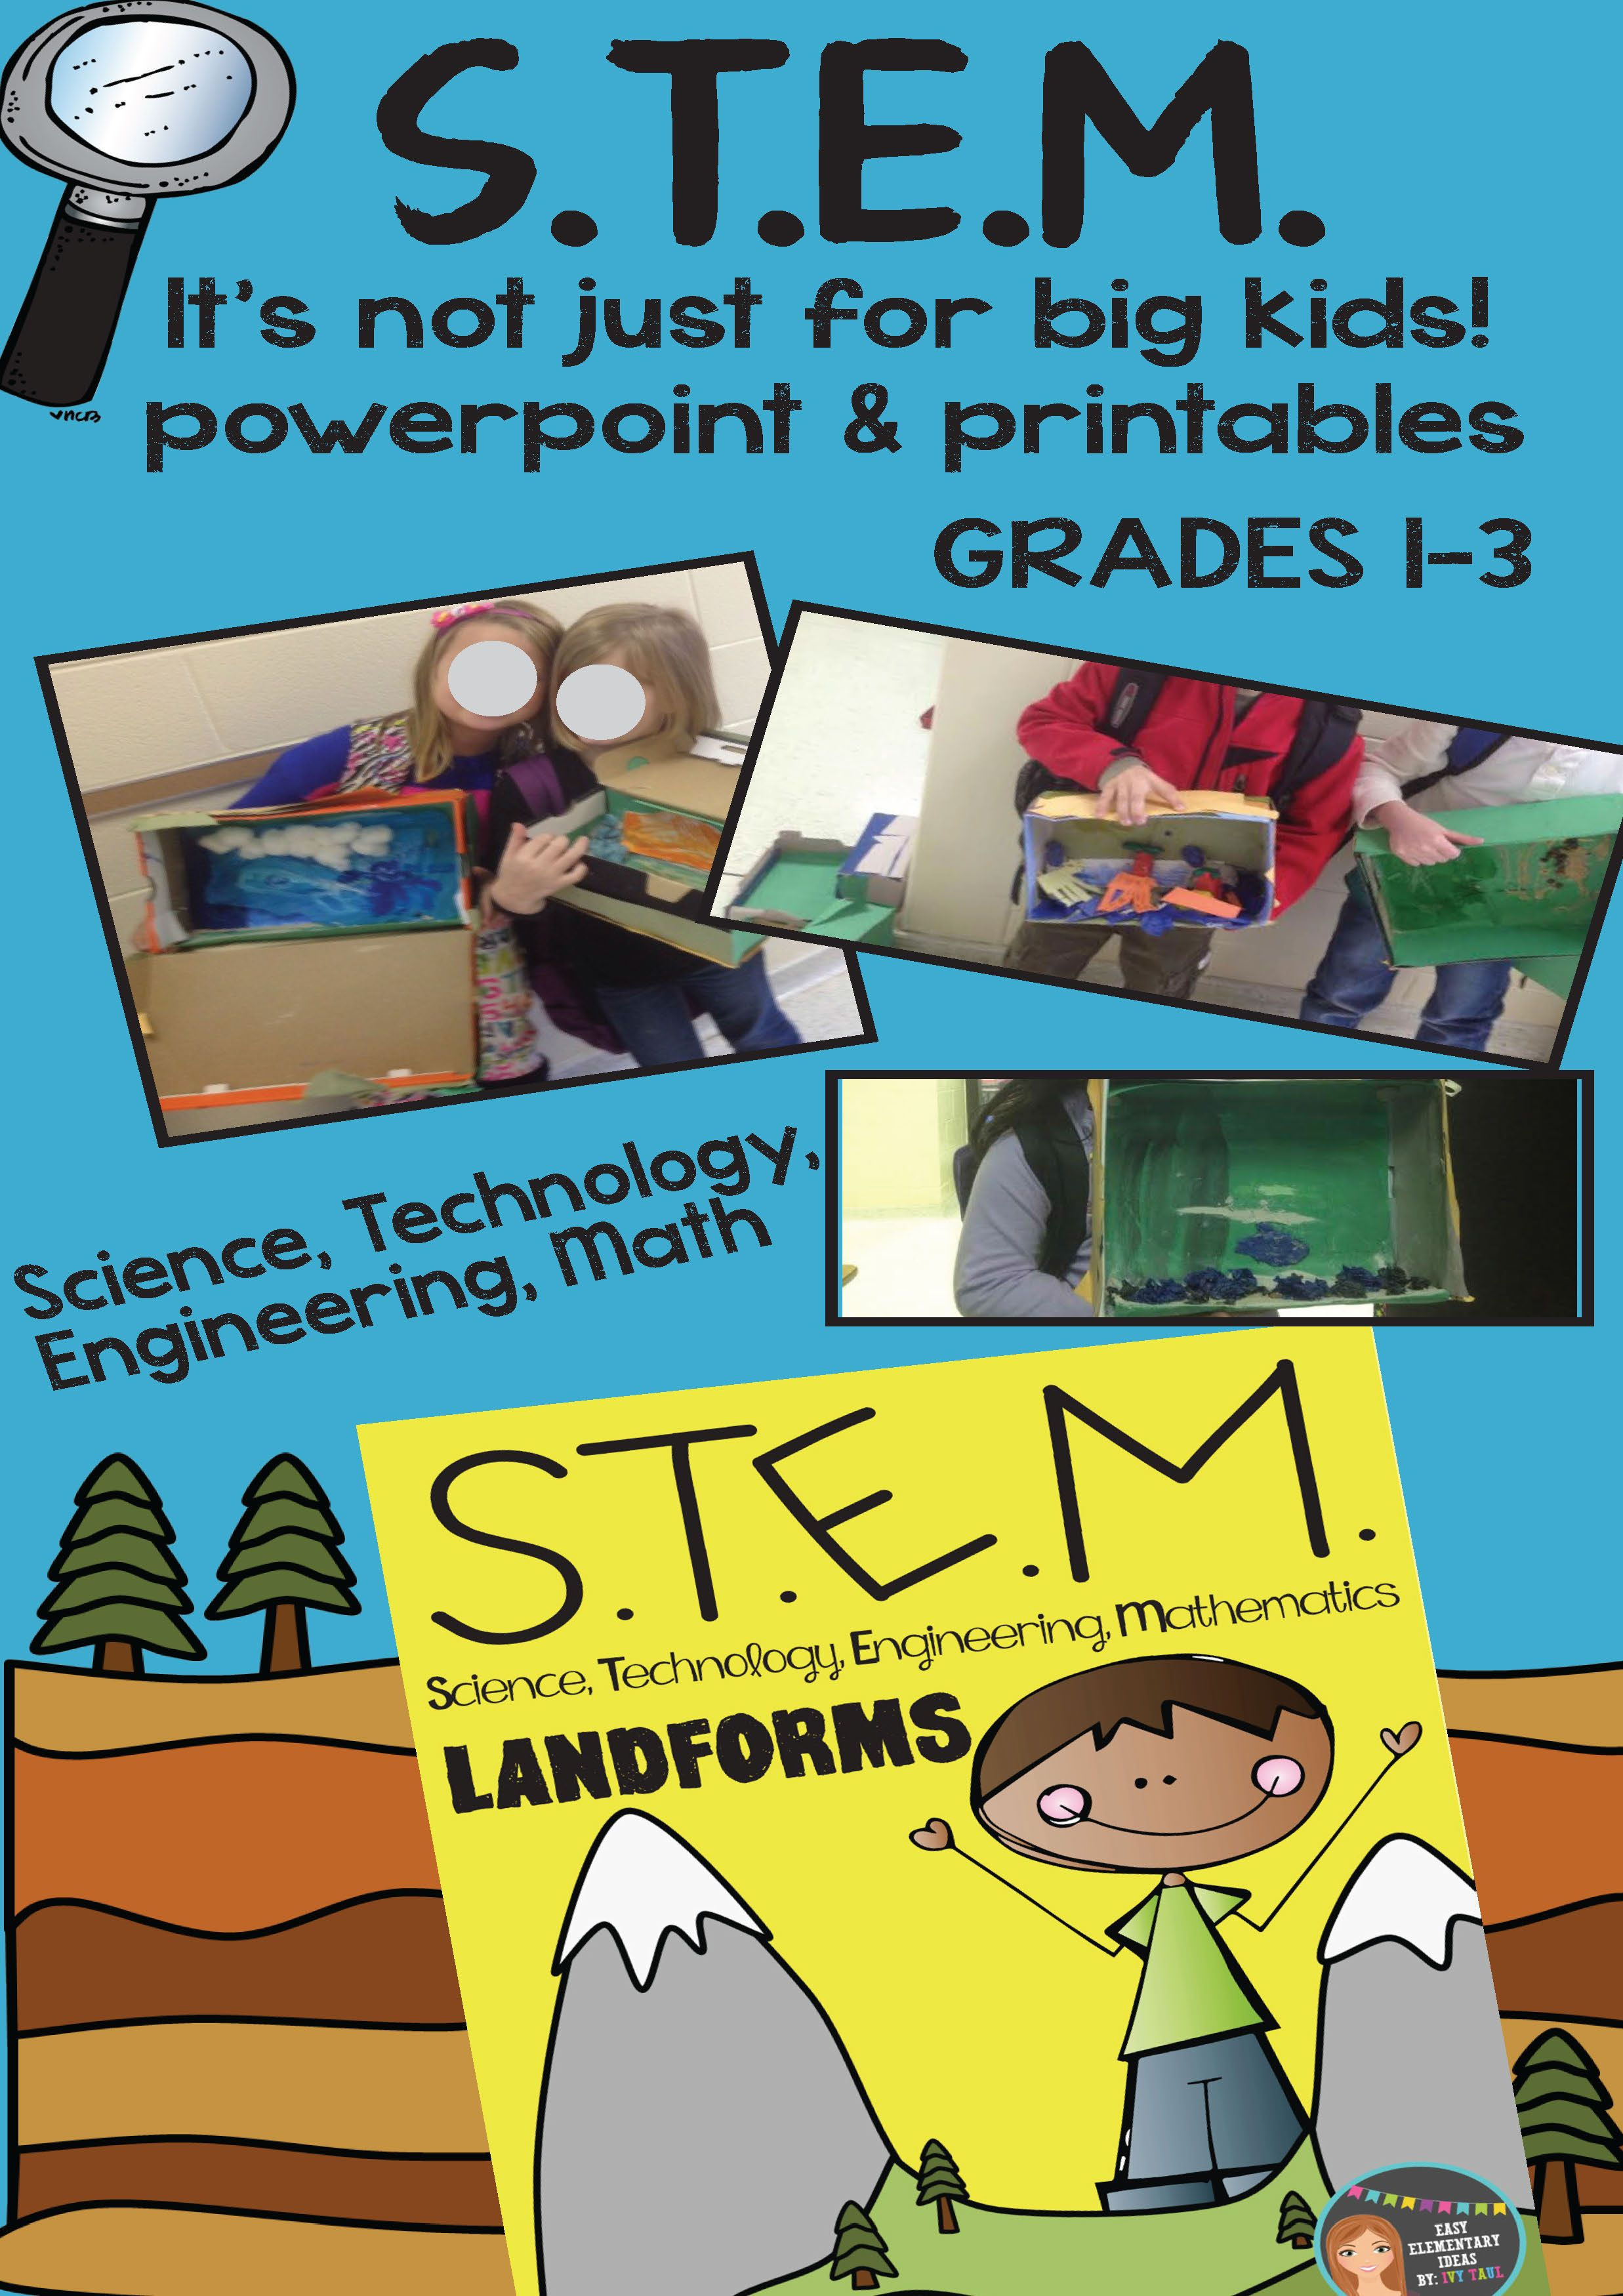 STEM Engineering - Landforms PDF & Powerpoint {Elementary